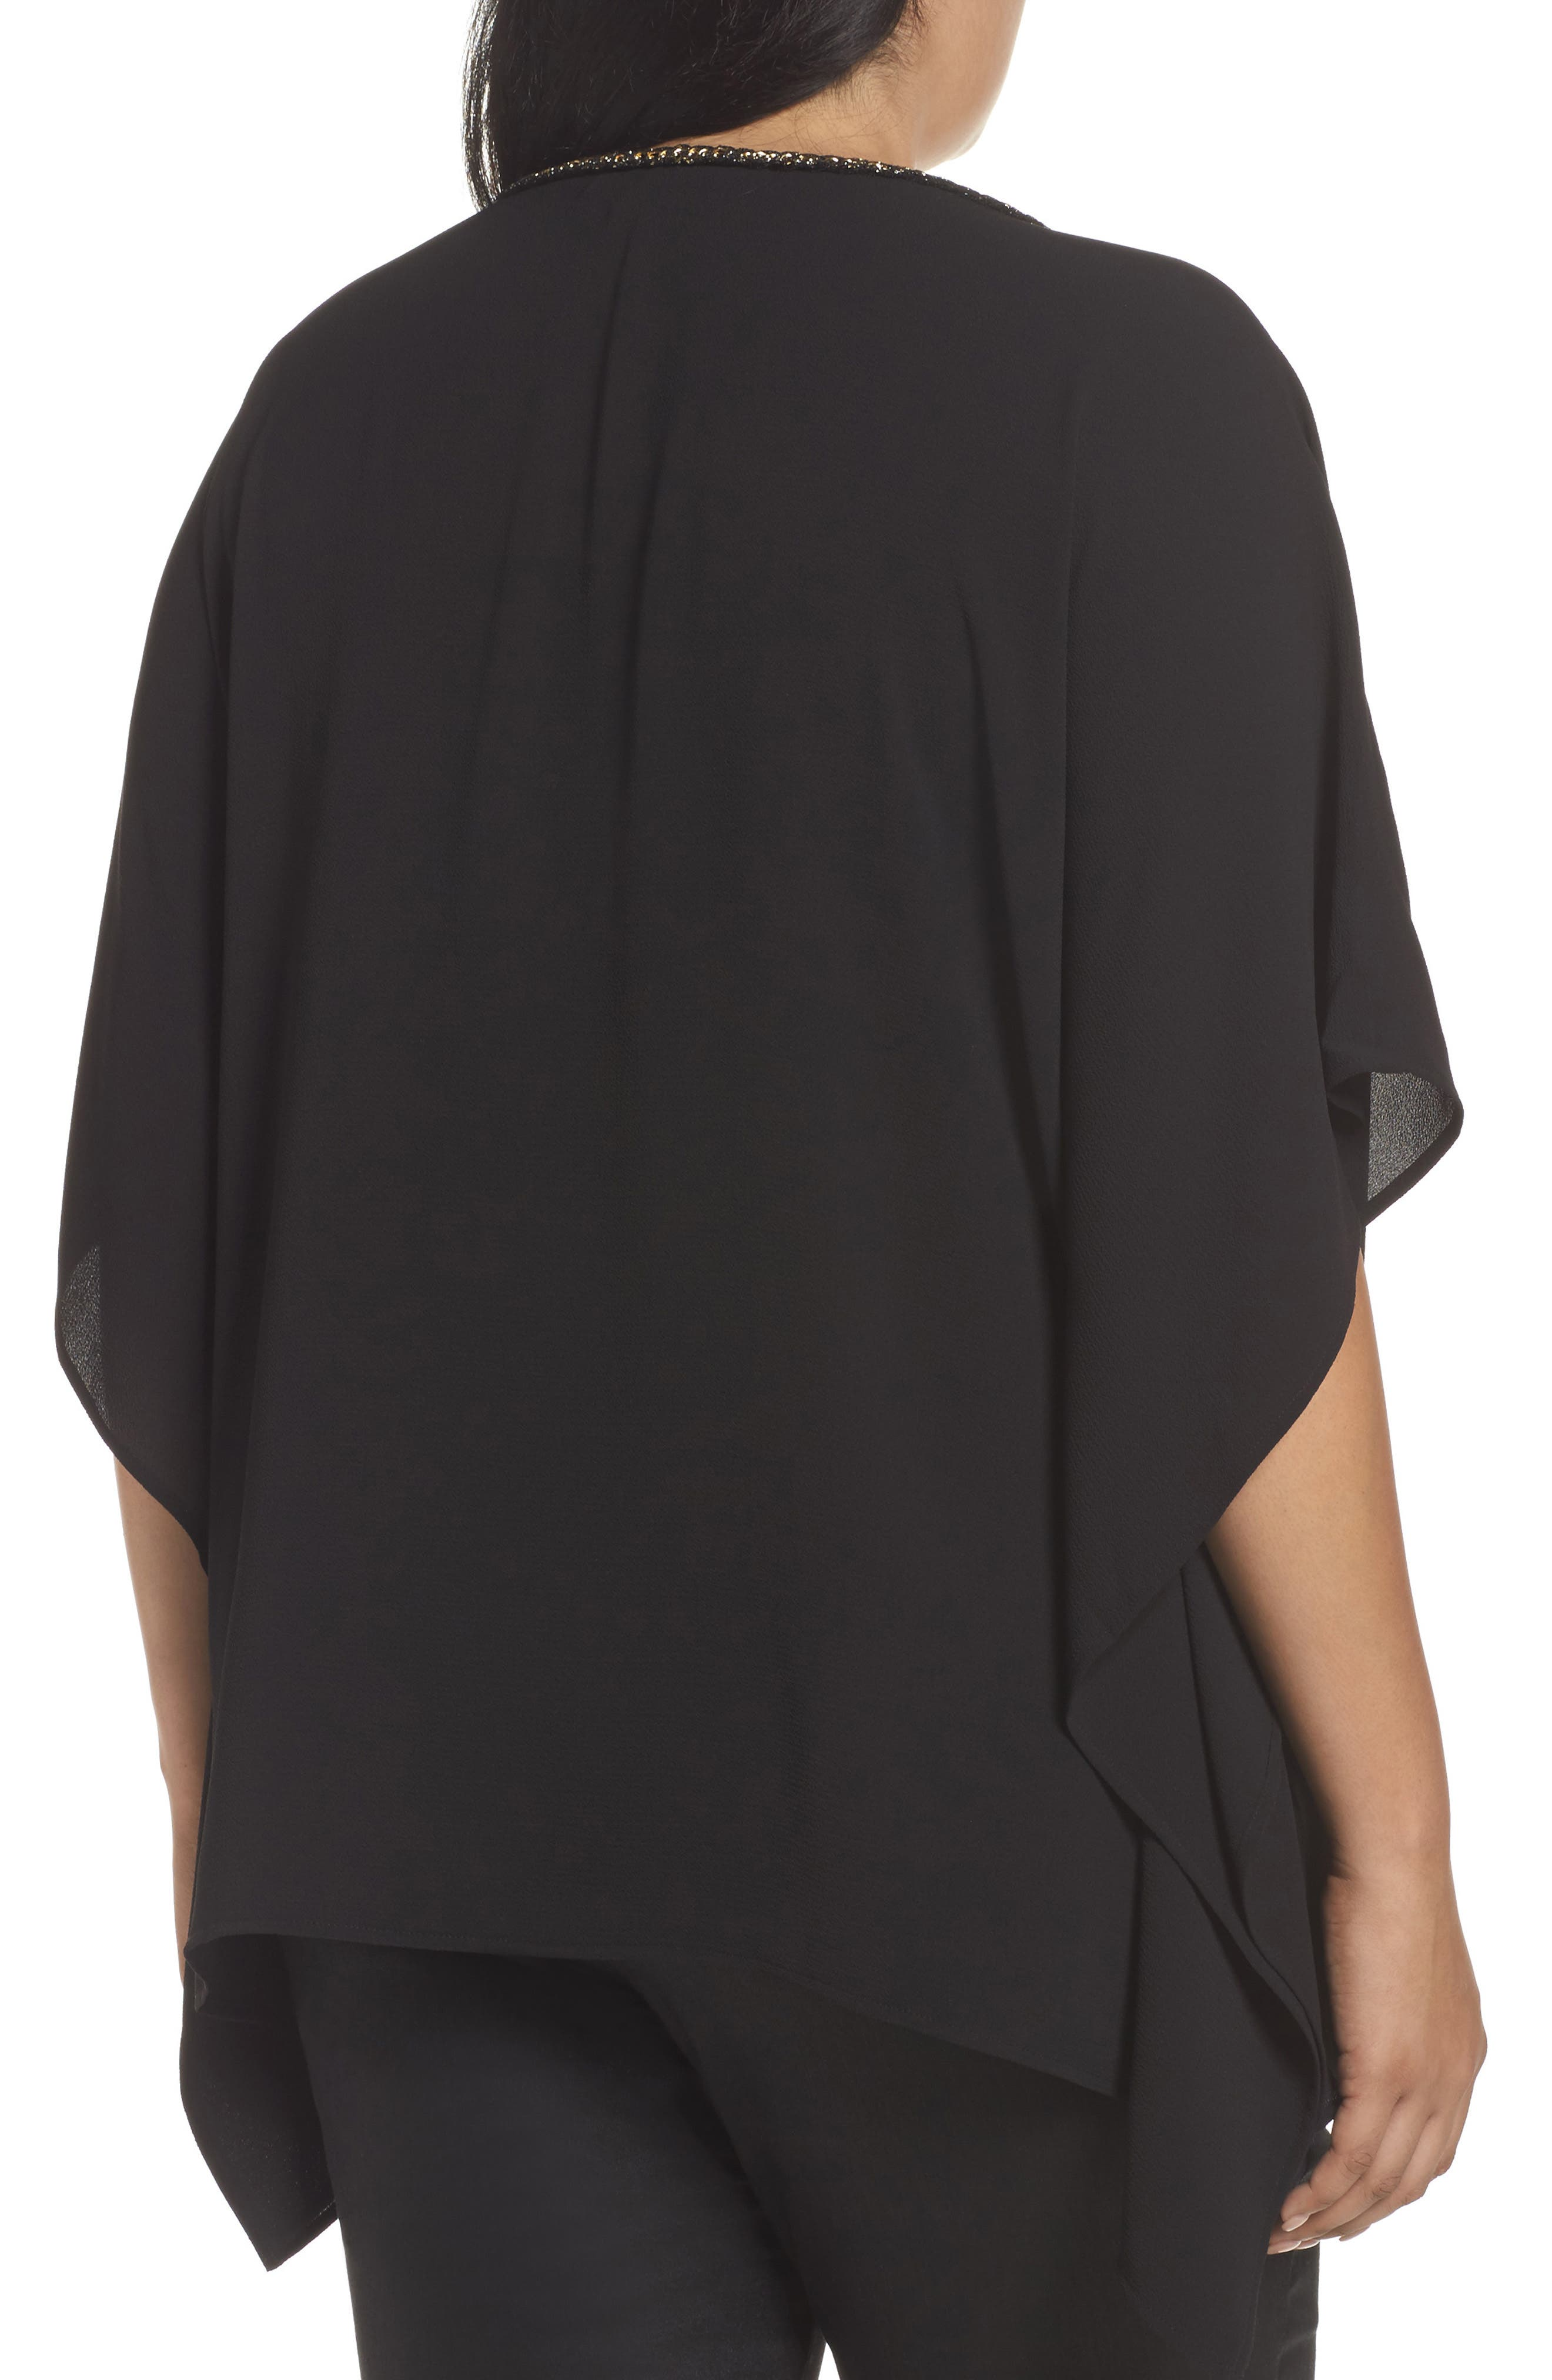 Alternate Image 2  - MICHAEL Michael Kors Chain Neck Top (Plus Size)